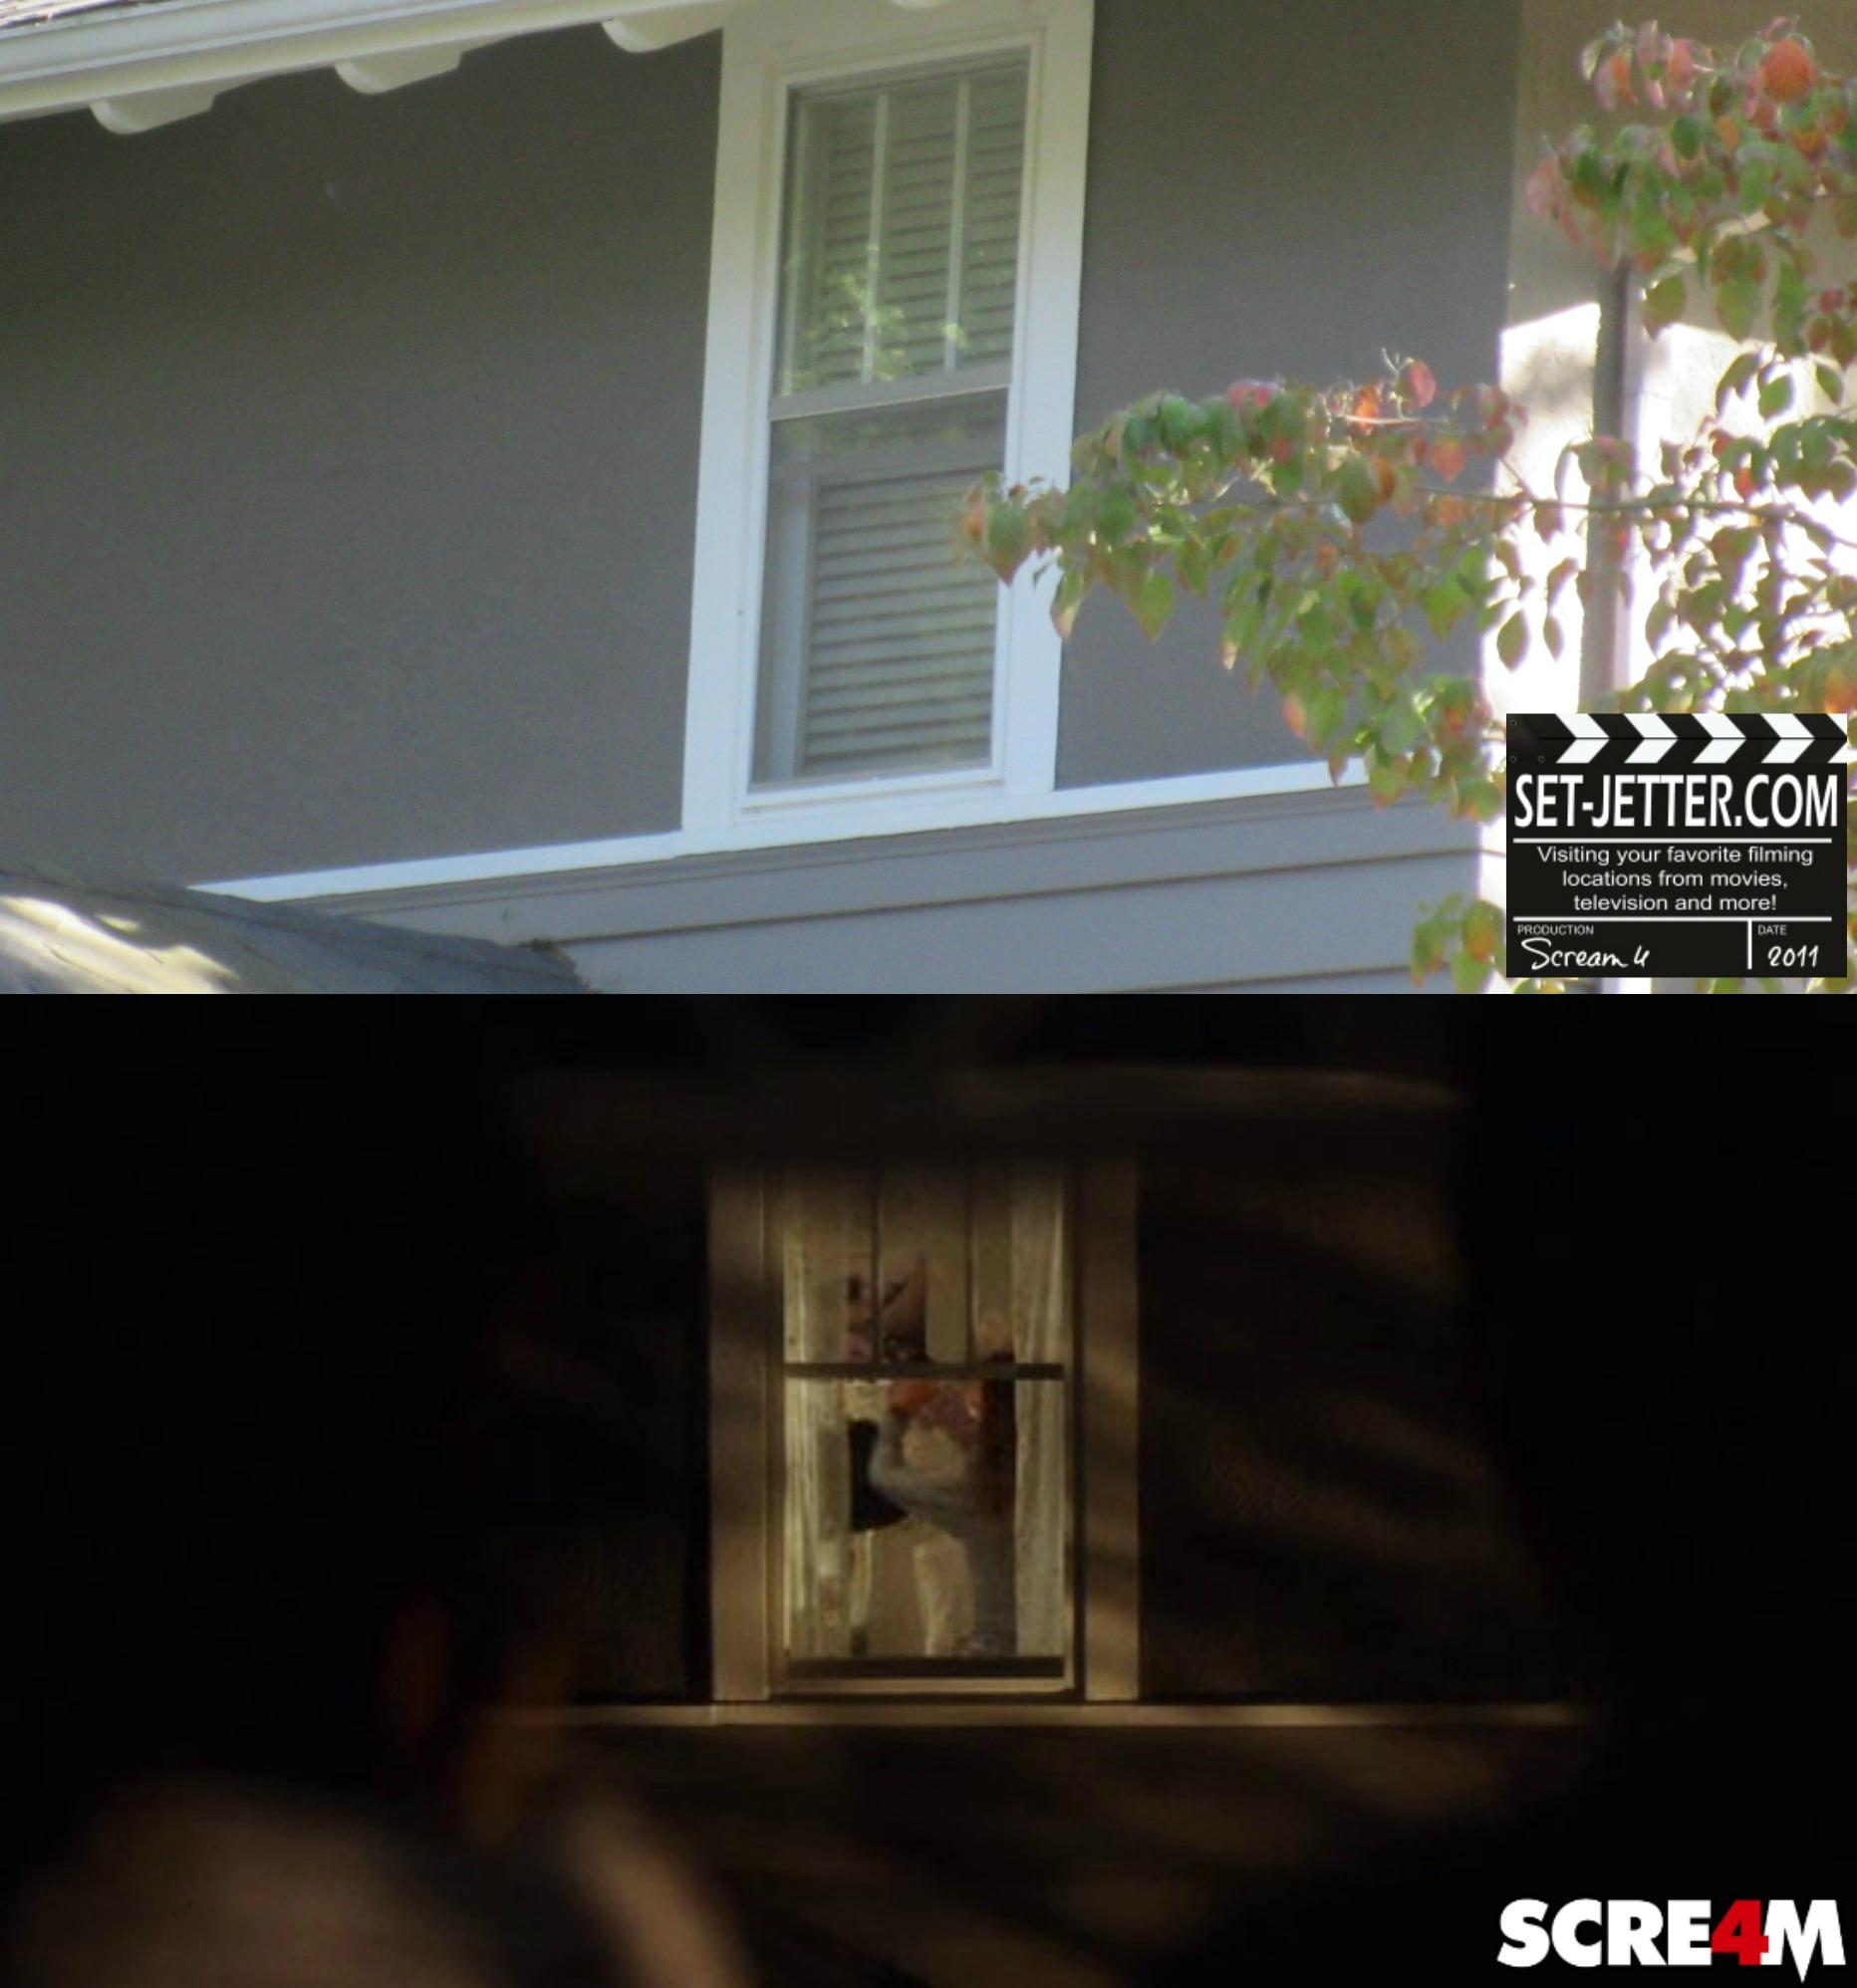 Scream4 comparison 114.jpg